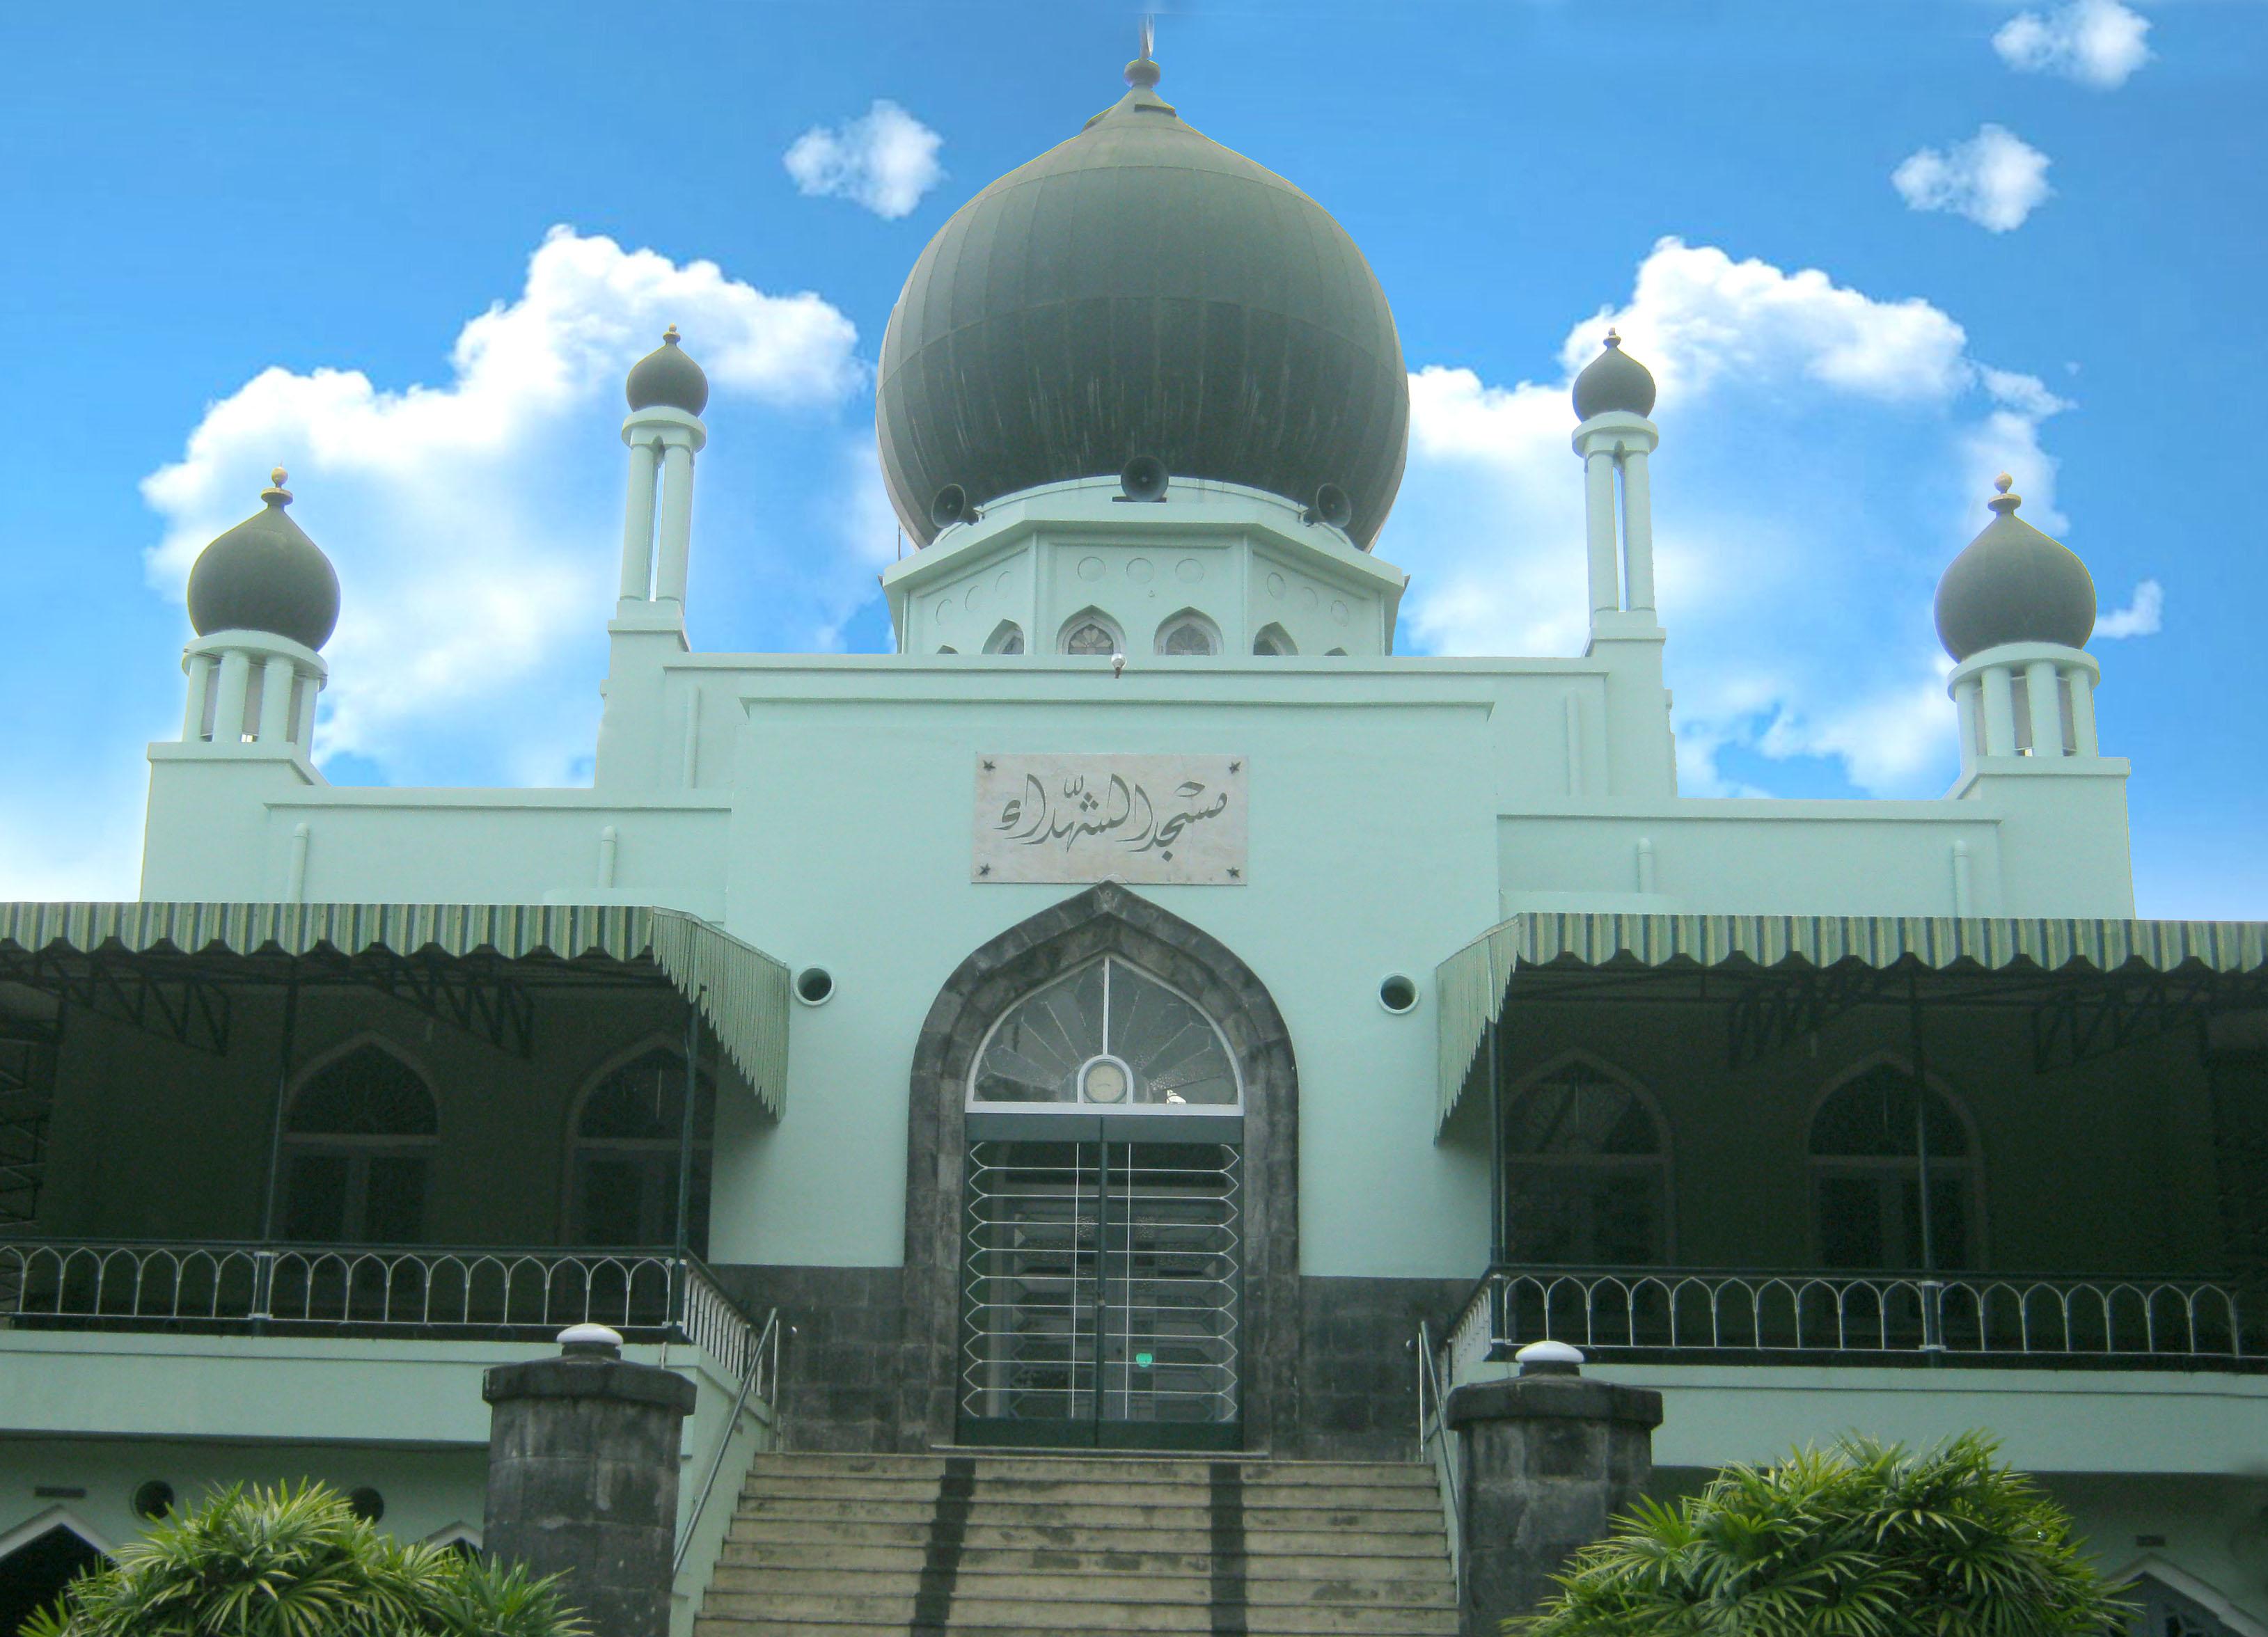 84b9d5a4abc6caad94b4459da6fa6917 Jpg Fasilitas Masjid Syuhada Kota Yogyakarta